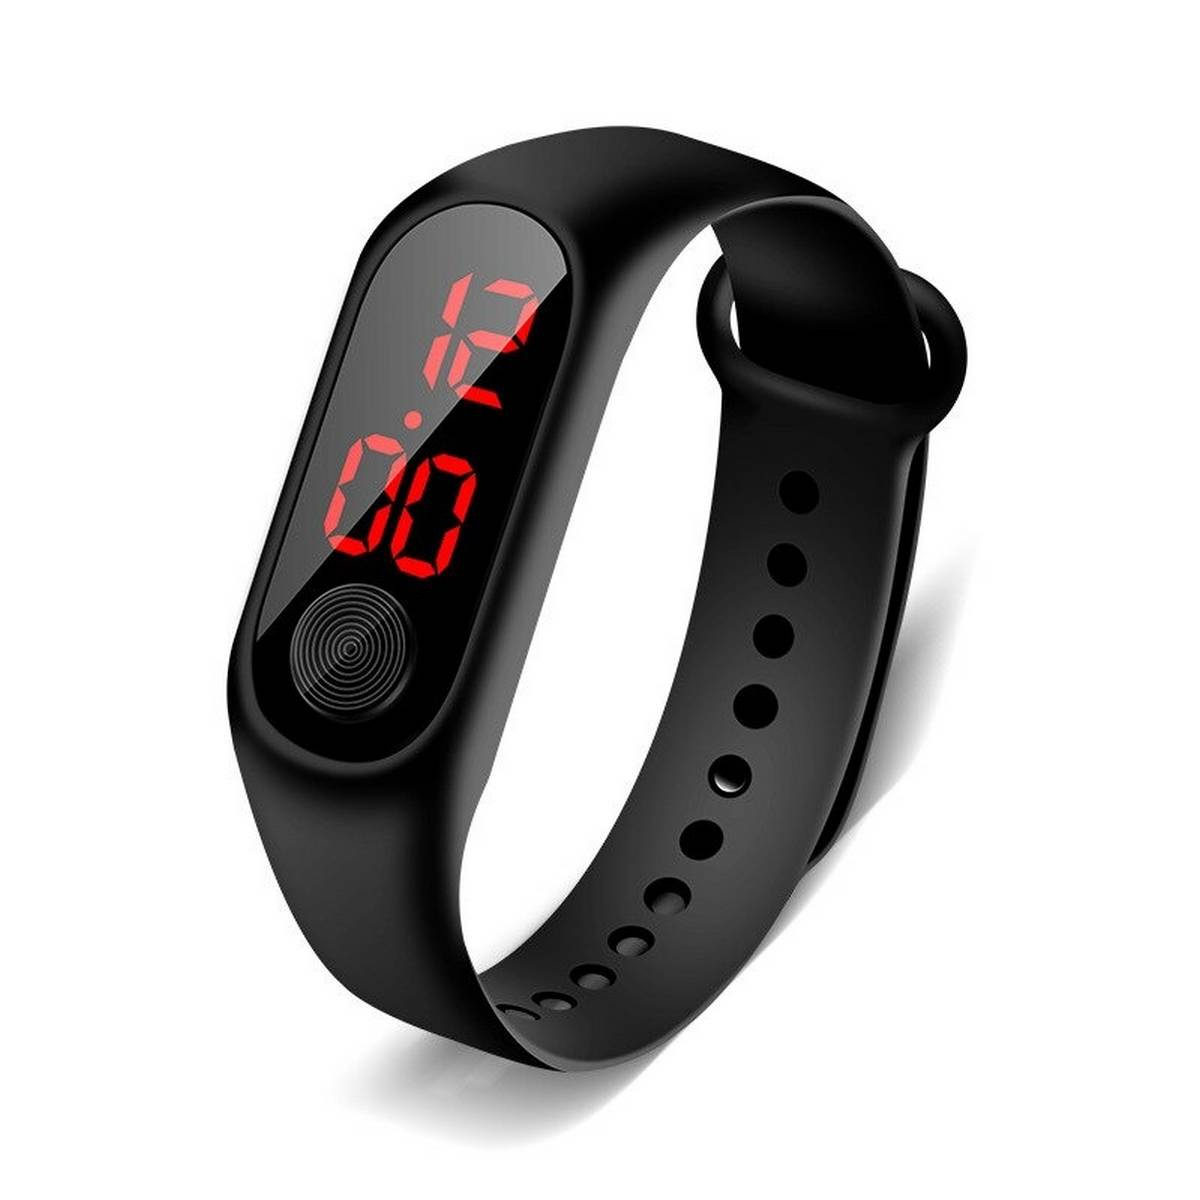 New LED digital watch men women casual fashion sports bracelet watch girls boys electronic silicone Band watch Gym watch School watch for kids